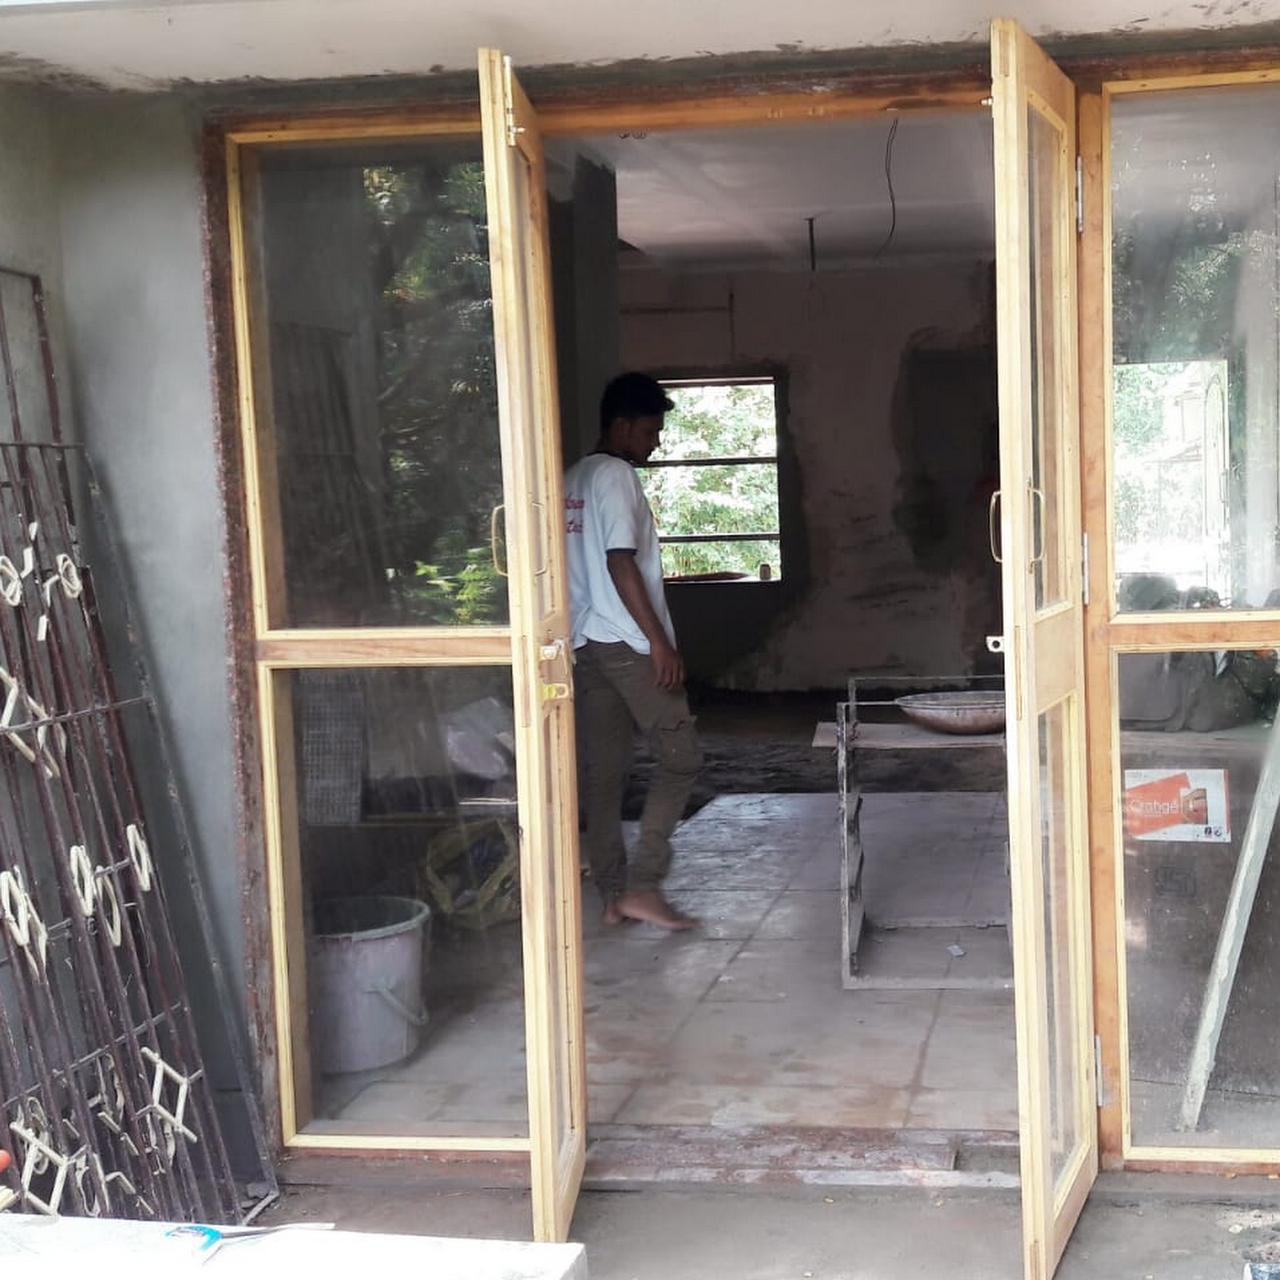 APNA CARPENTERS - Carpenter in mumbai